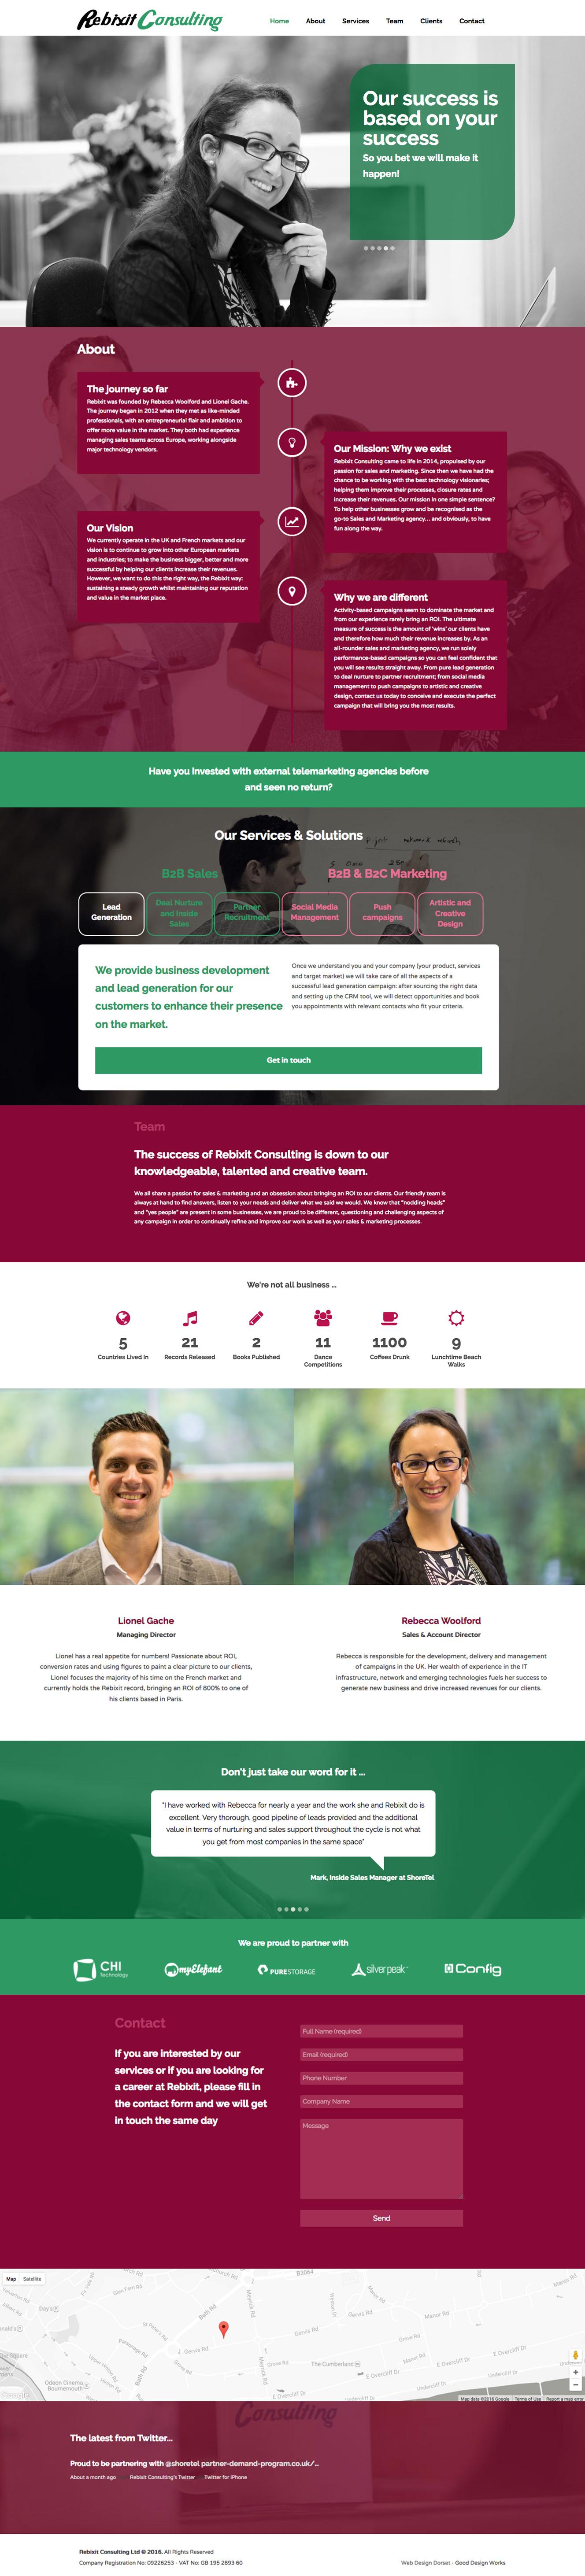 Our Work Portfolio Website Design Cool Designs Website Design